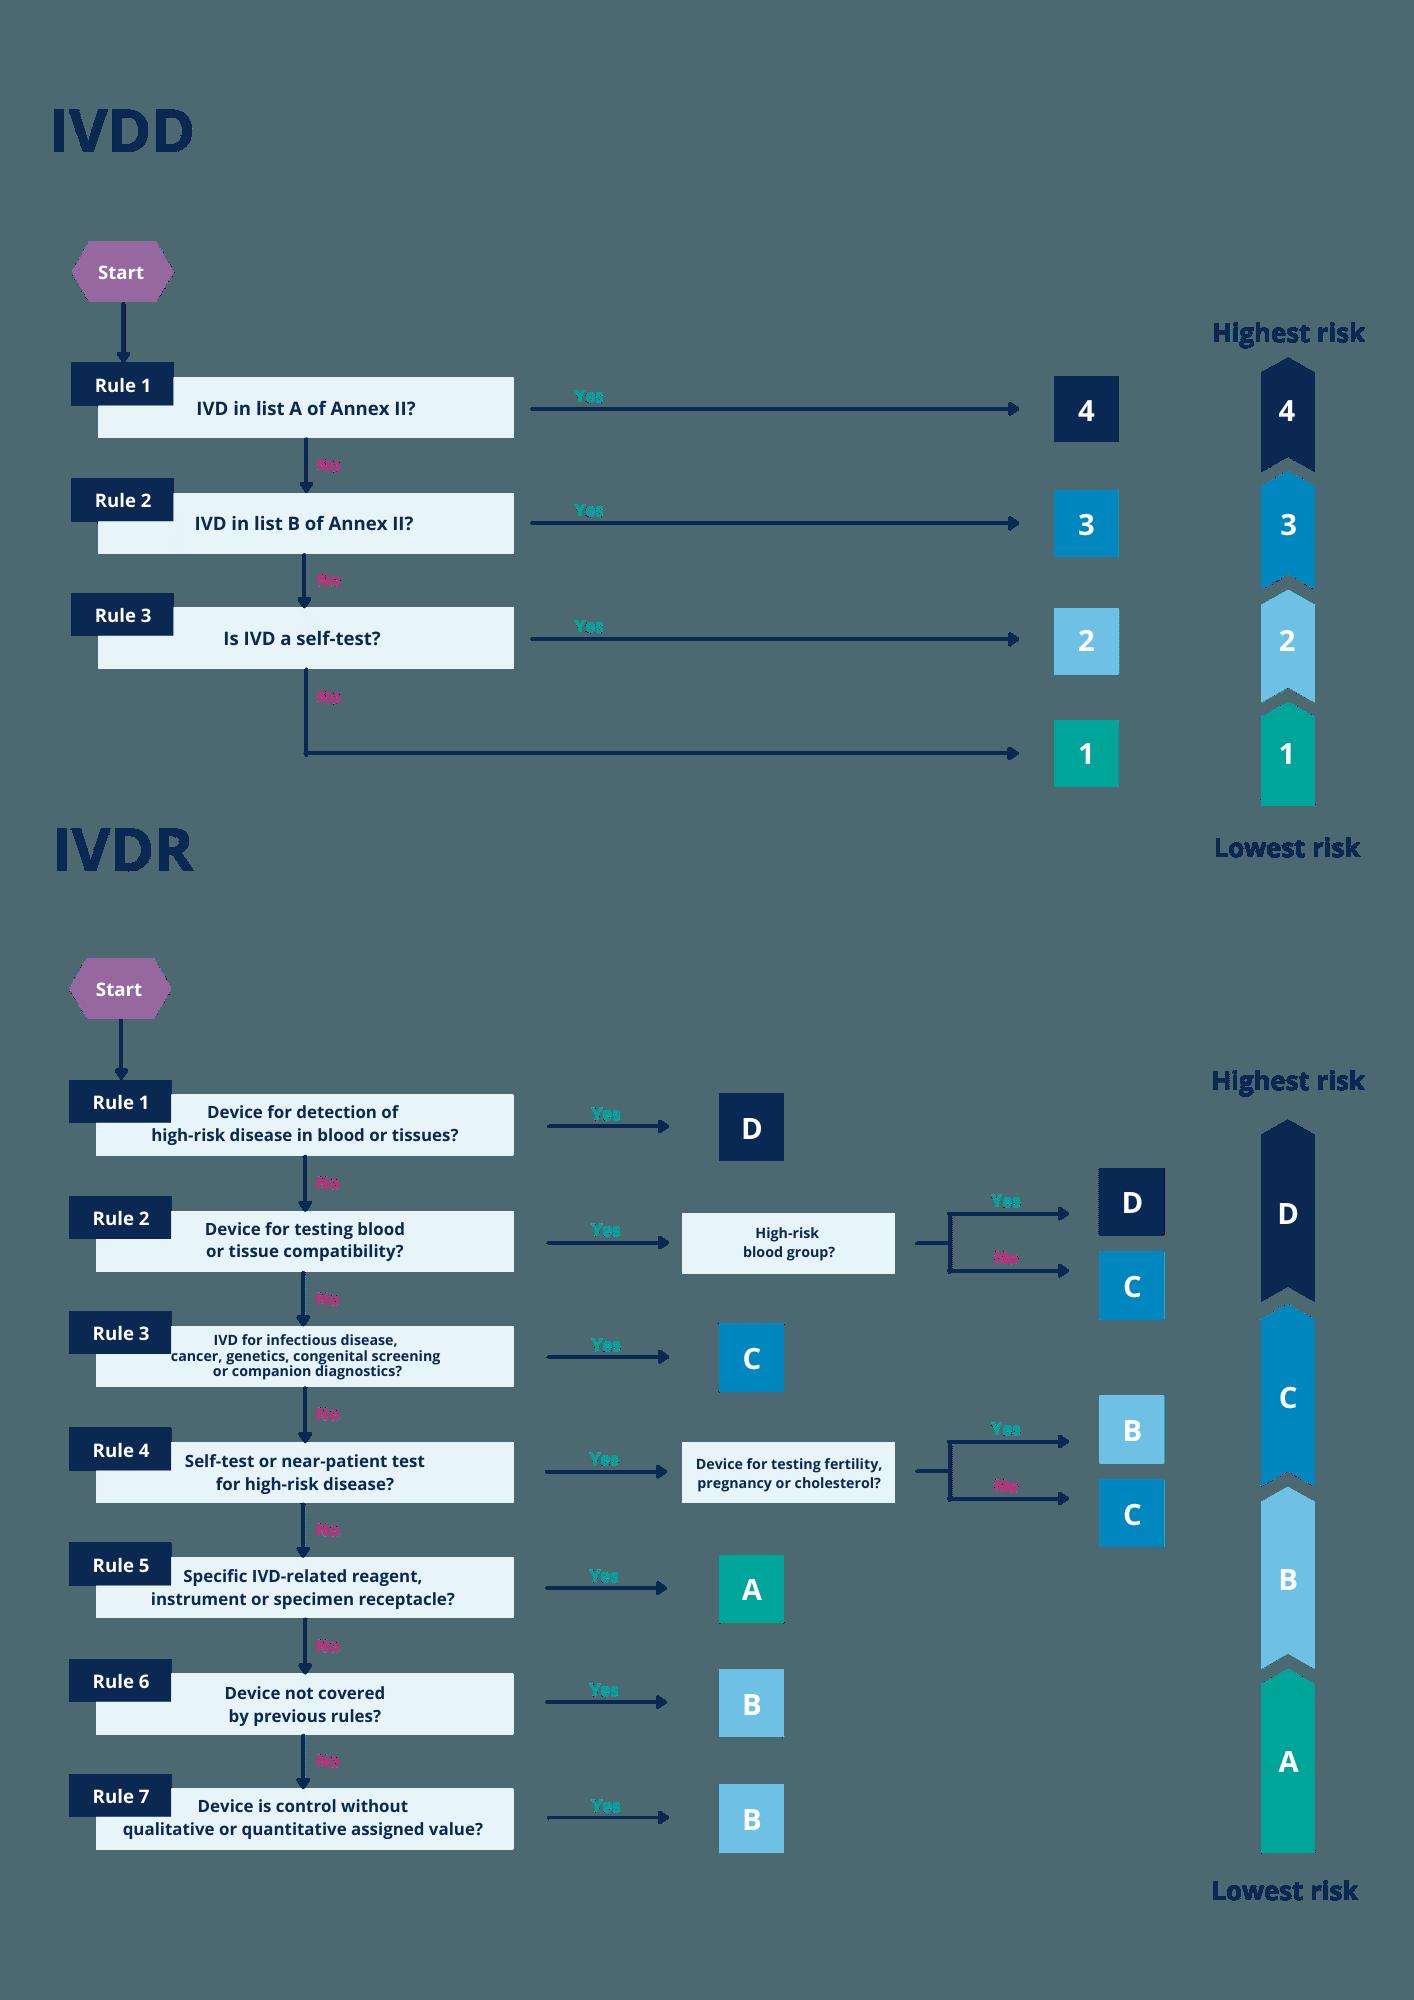 Flowcharts describing the classification process under IVDD and IVDR - IVDR classification - QBD